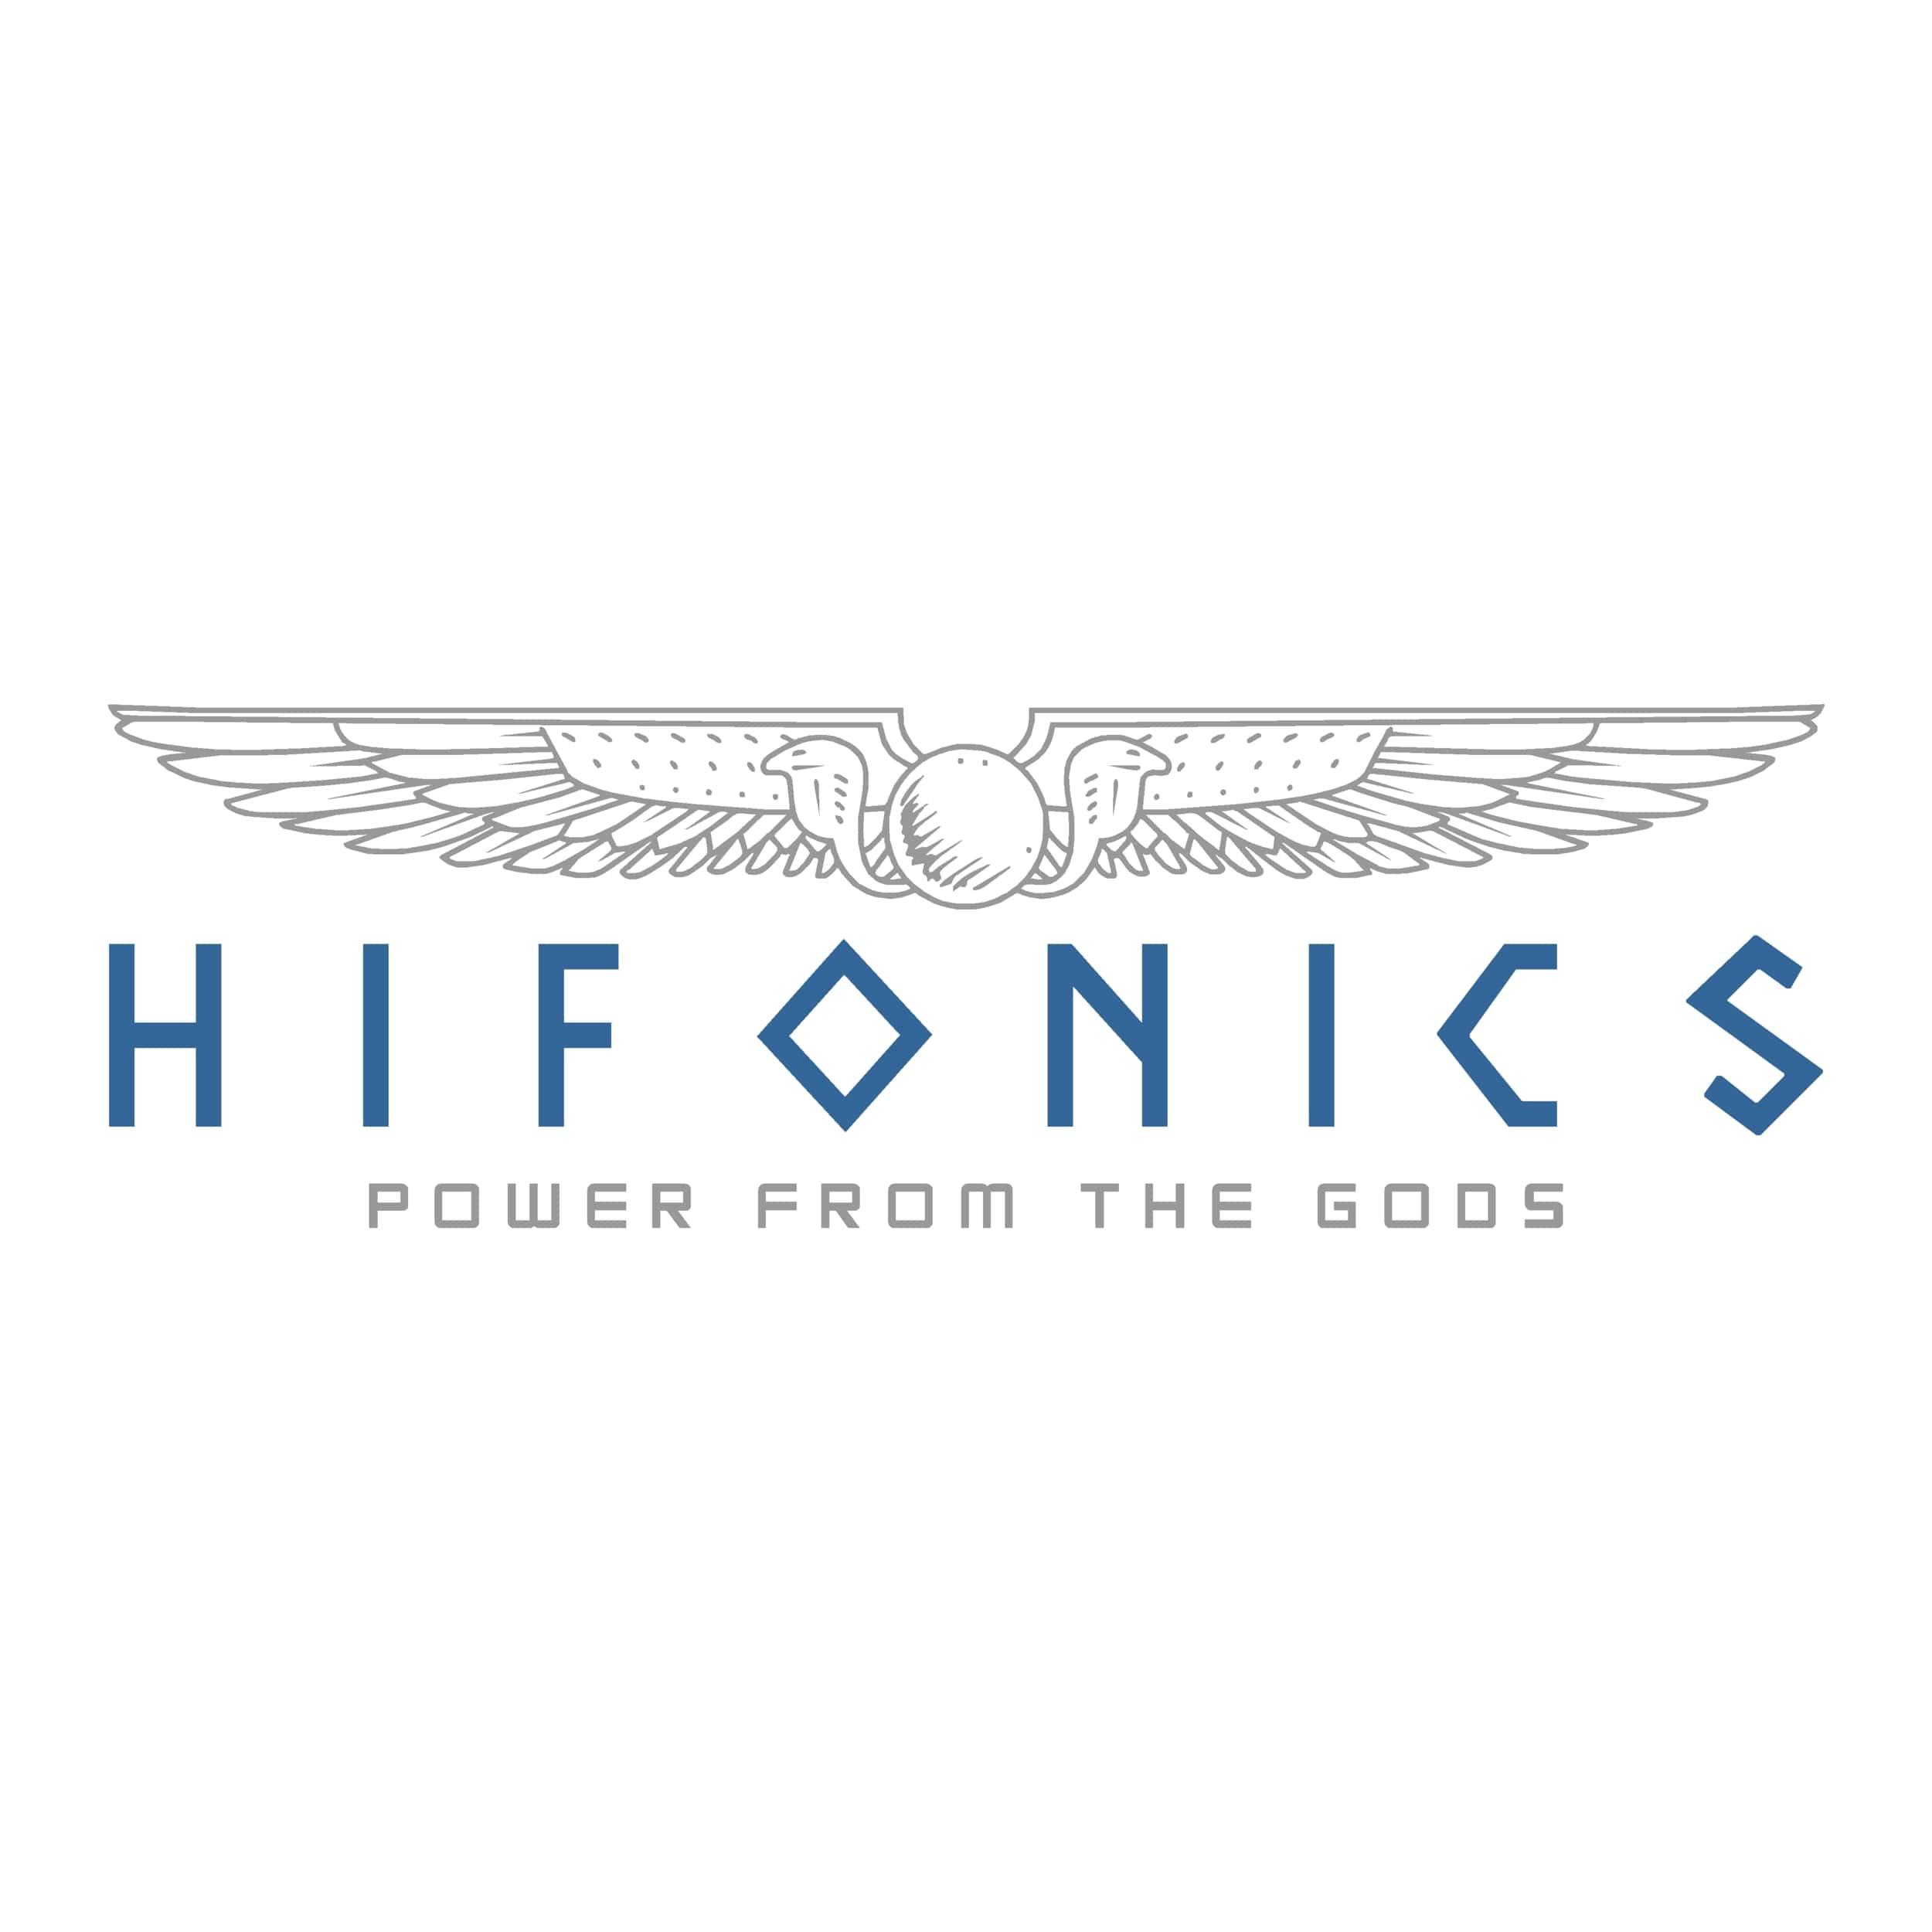 sticker-hifonics-ref-3-tuning-audio-sonorisation-car-auto-moto-camion-competition-deco-rallye-autocollant-min